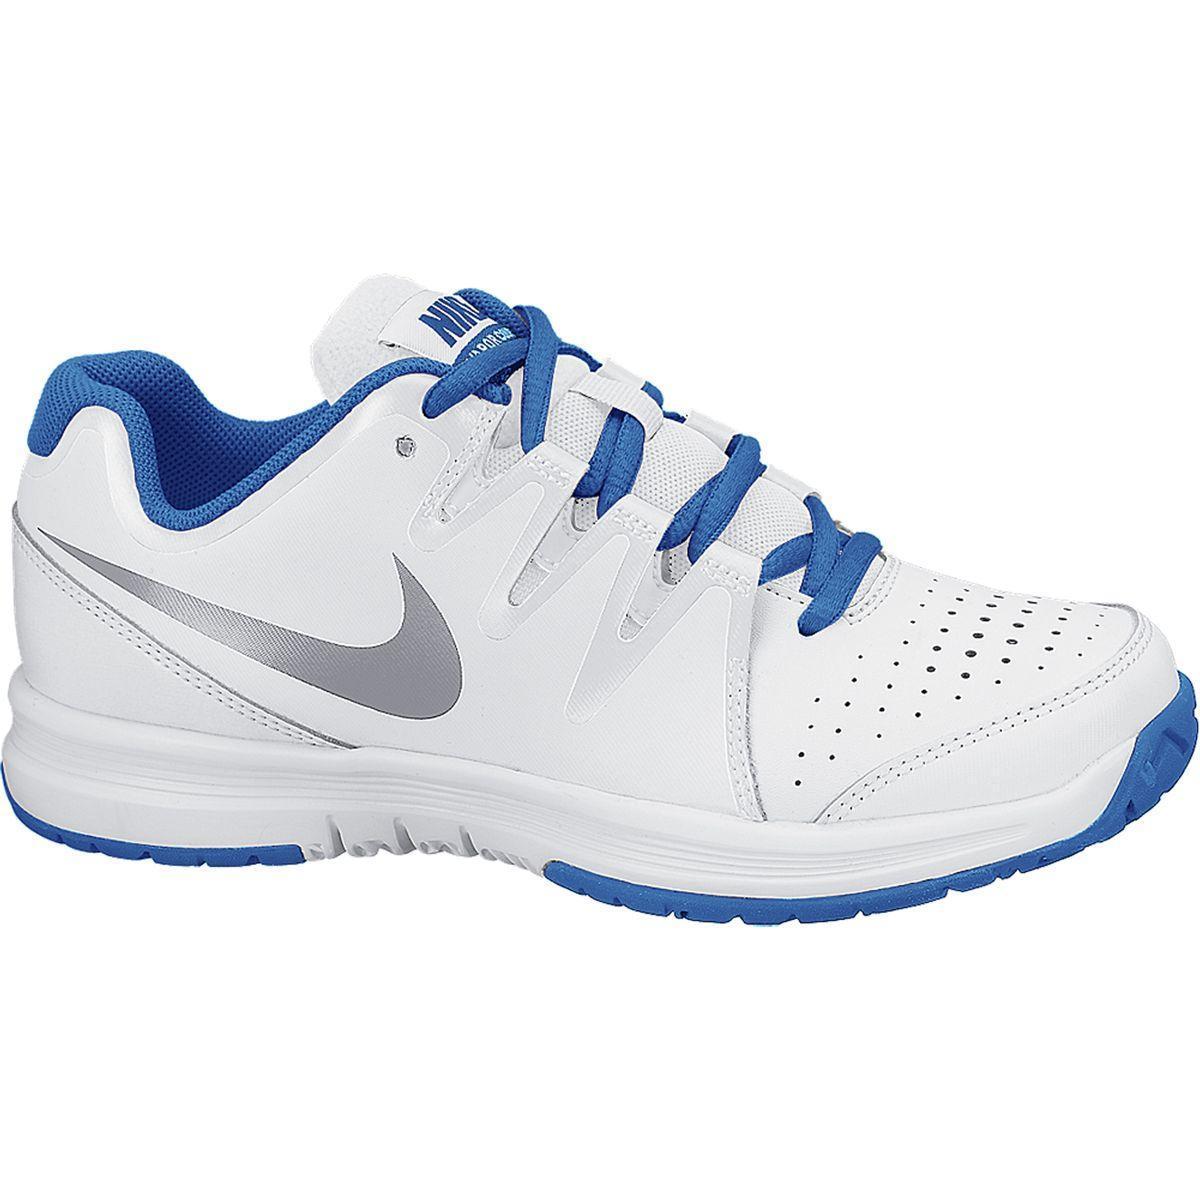 nike boy tennis shoes